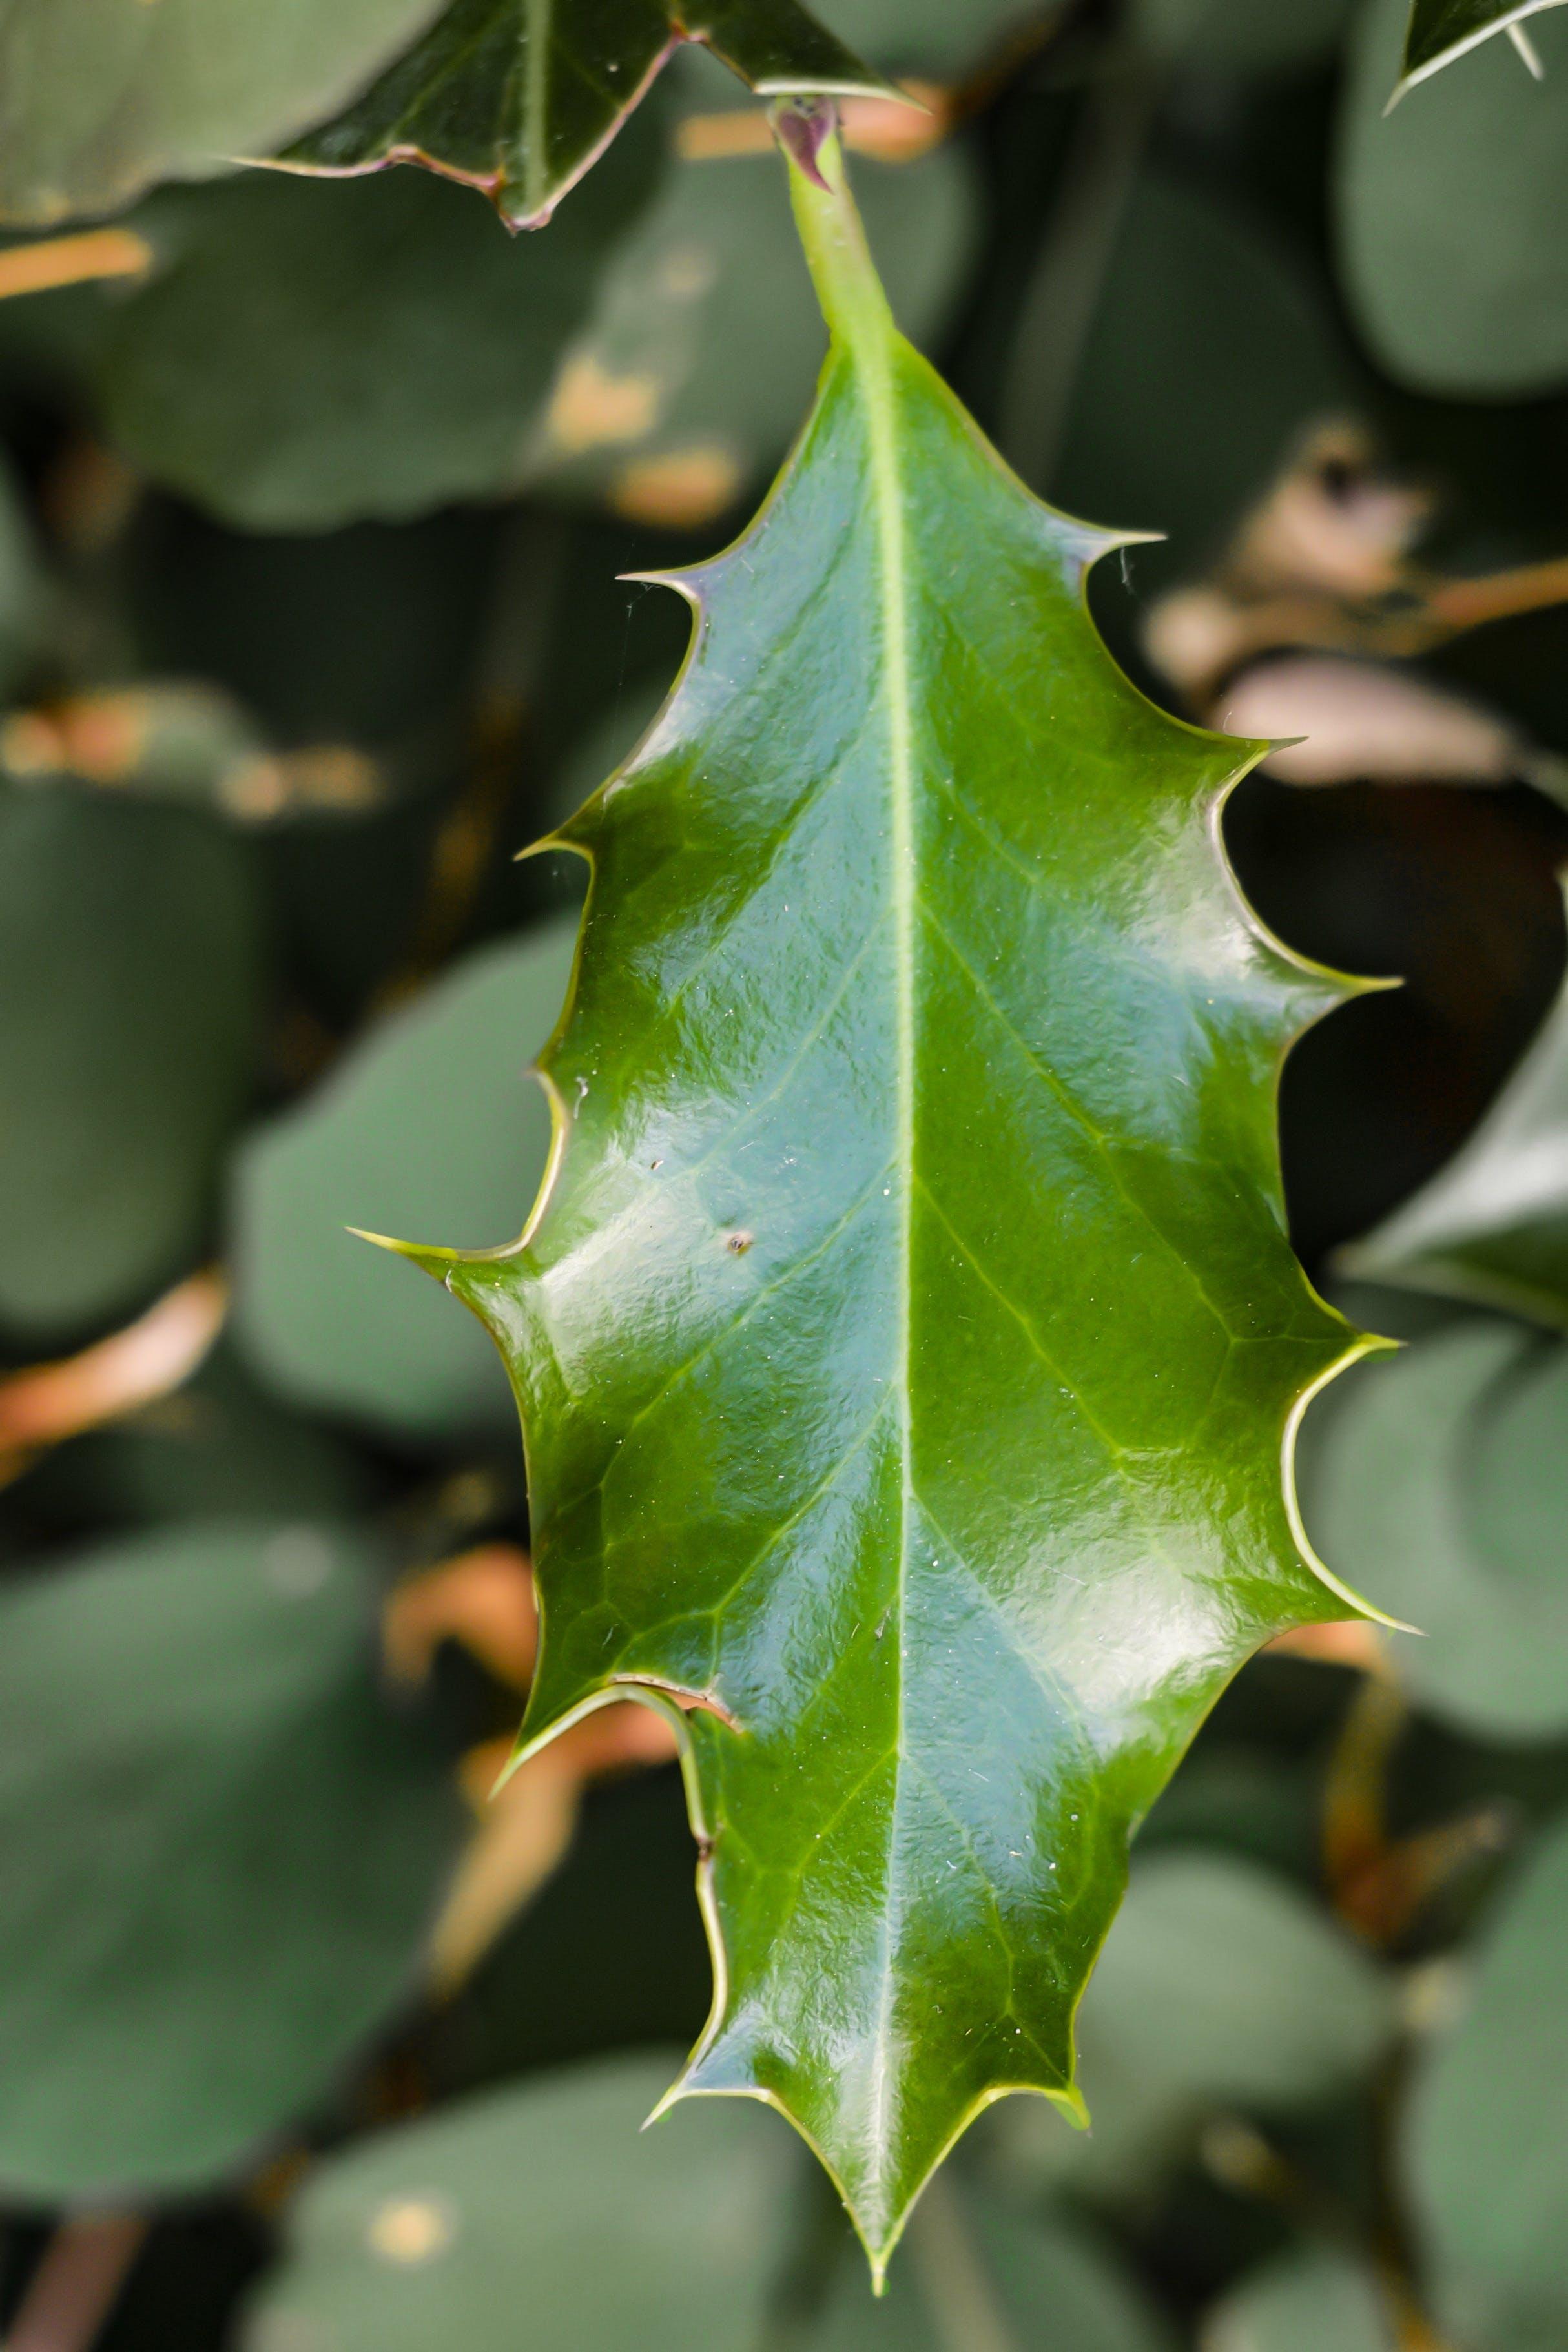 Green Leaf in Close Up Photo